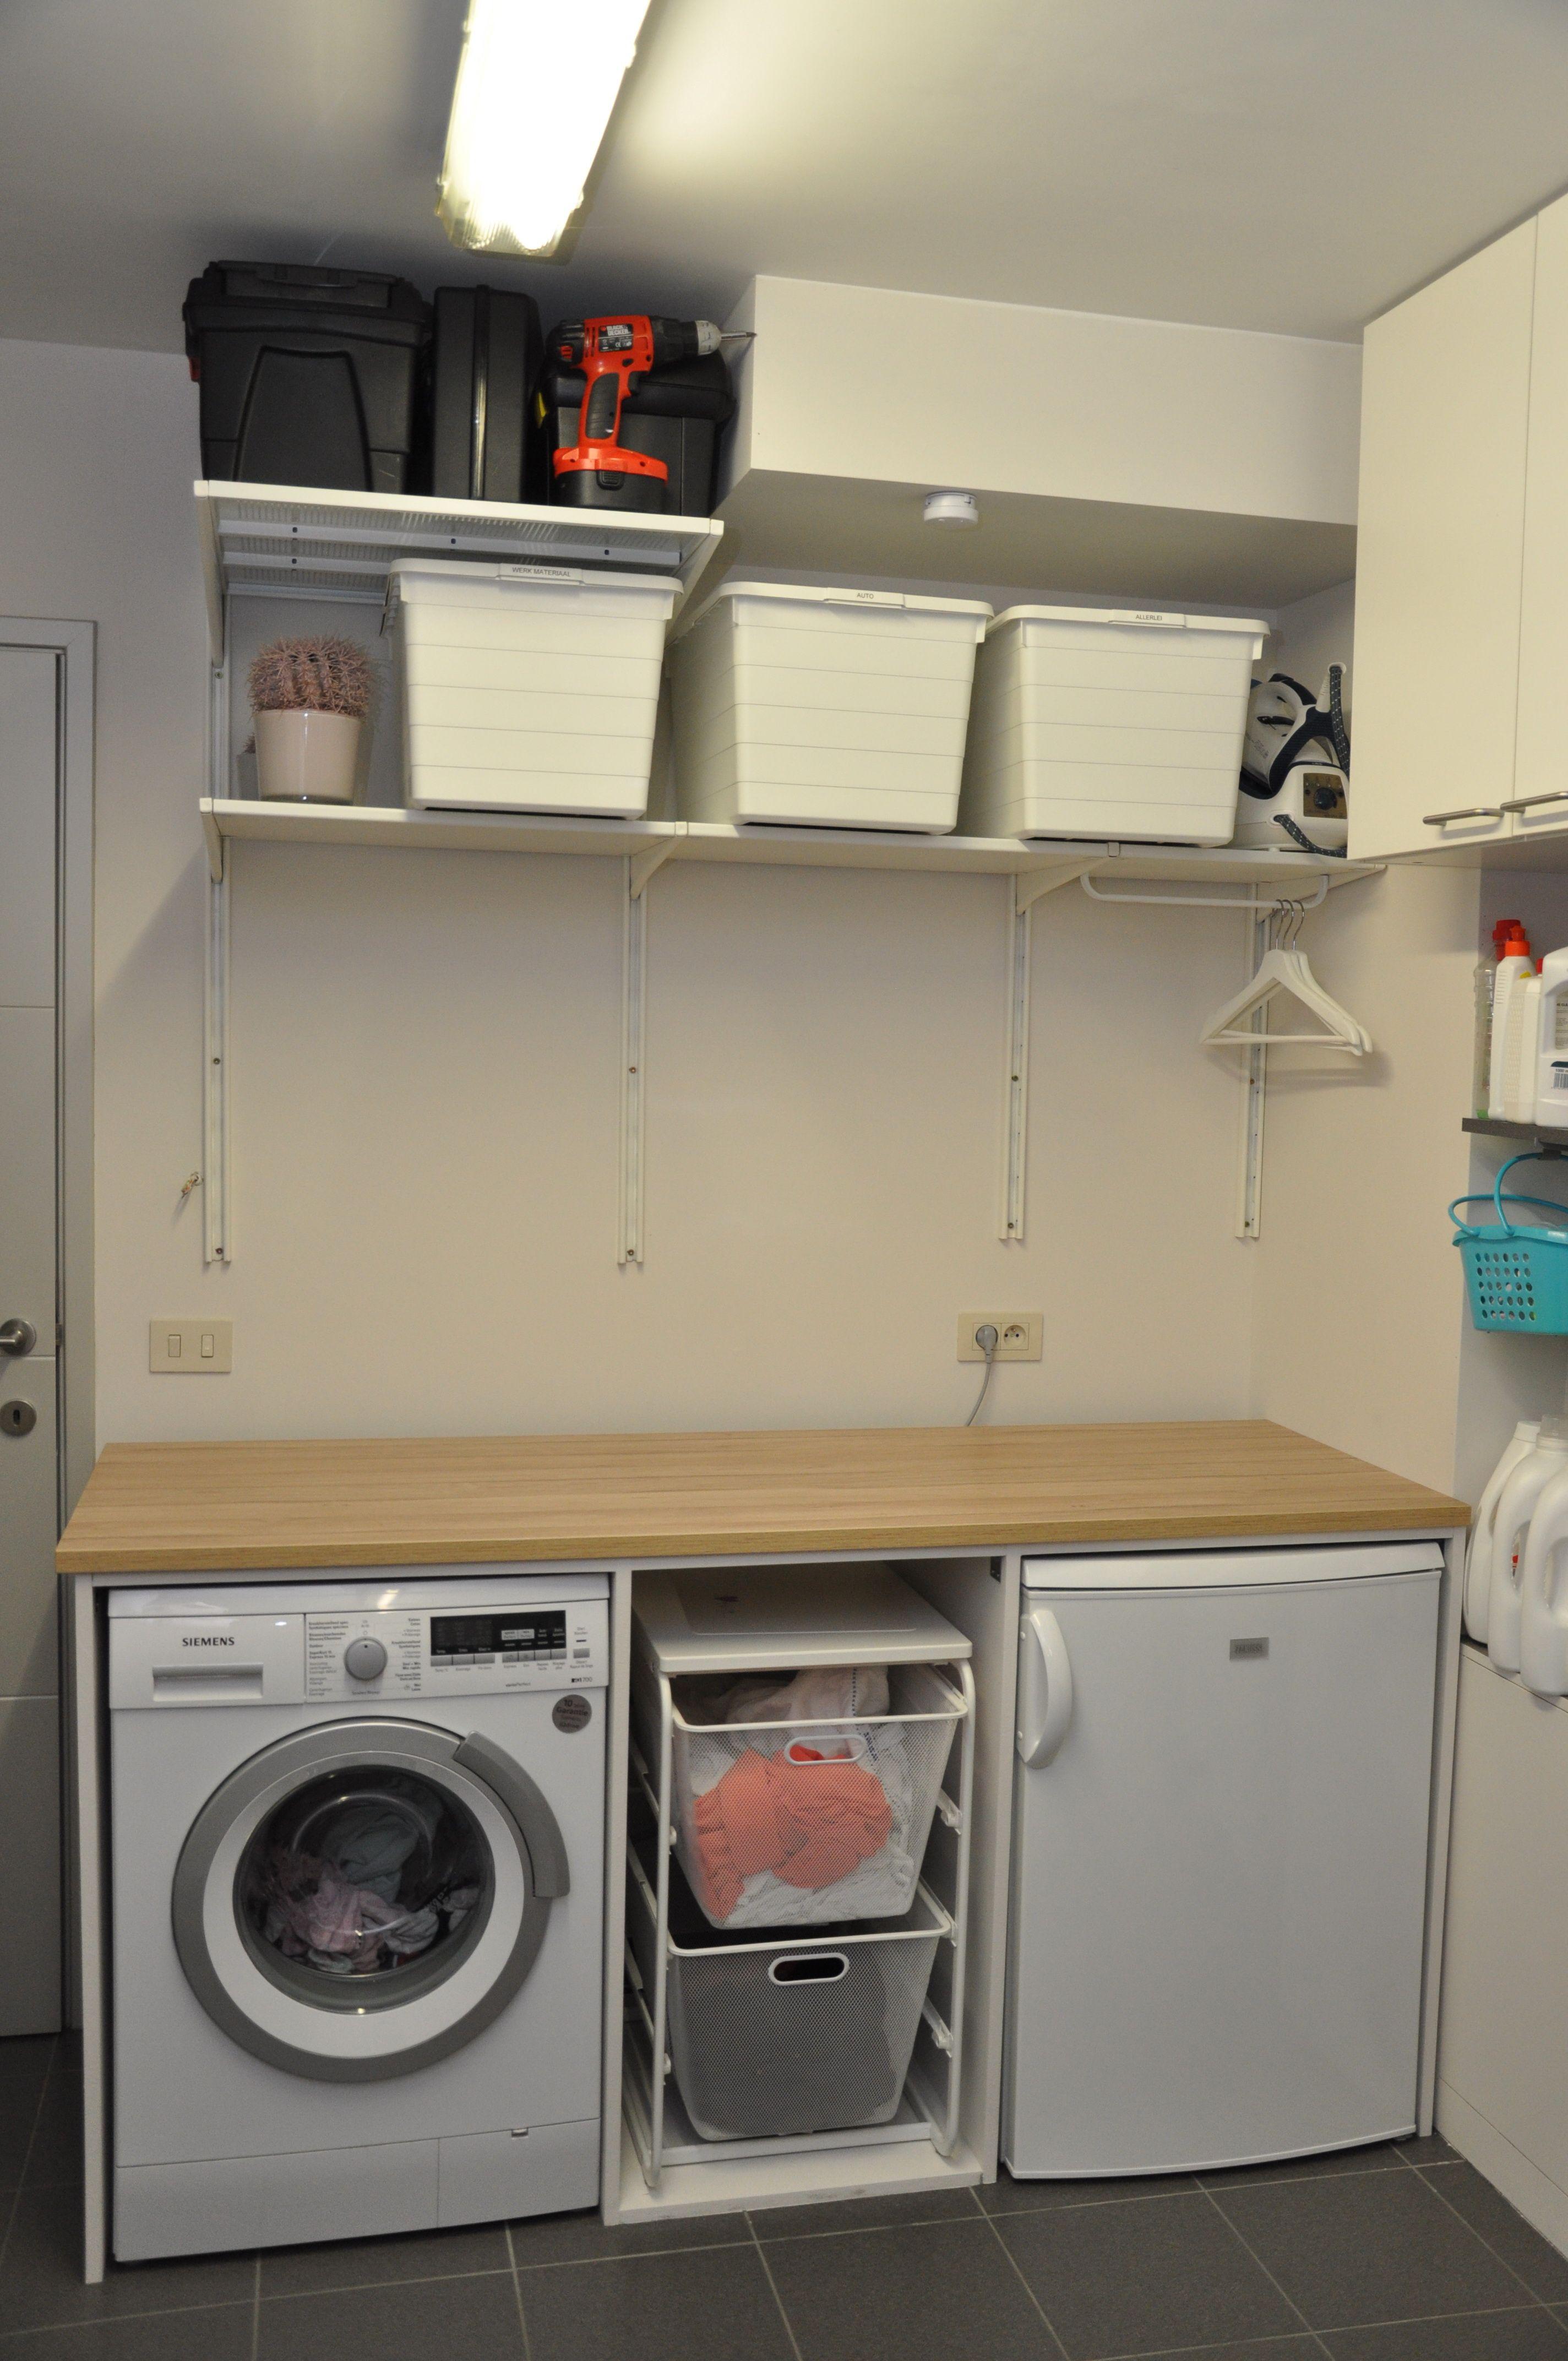 Verrassend Wasplaats. Wasmachine, wasrek en extra frigo ingebouwd. Ikea Algot SH-12